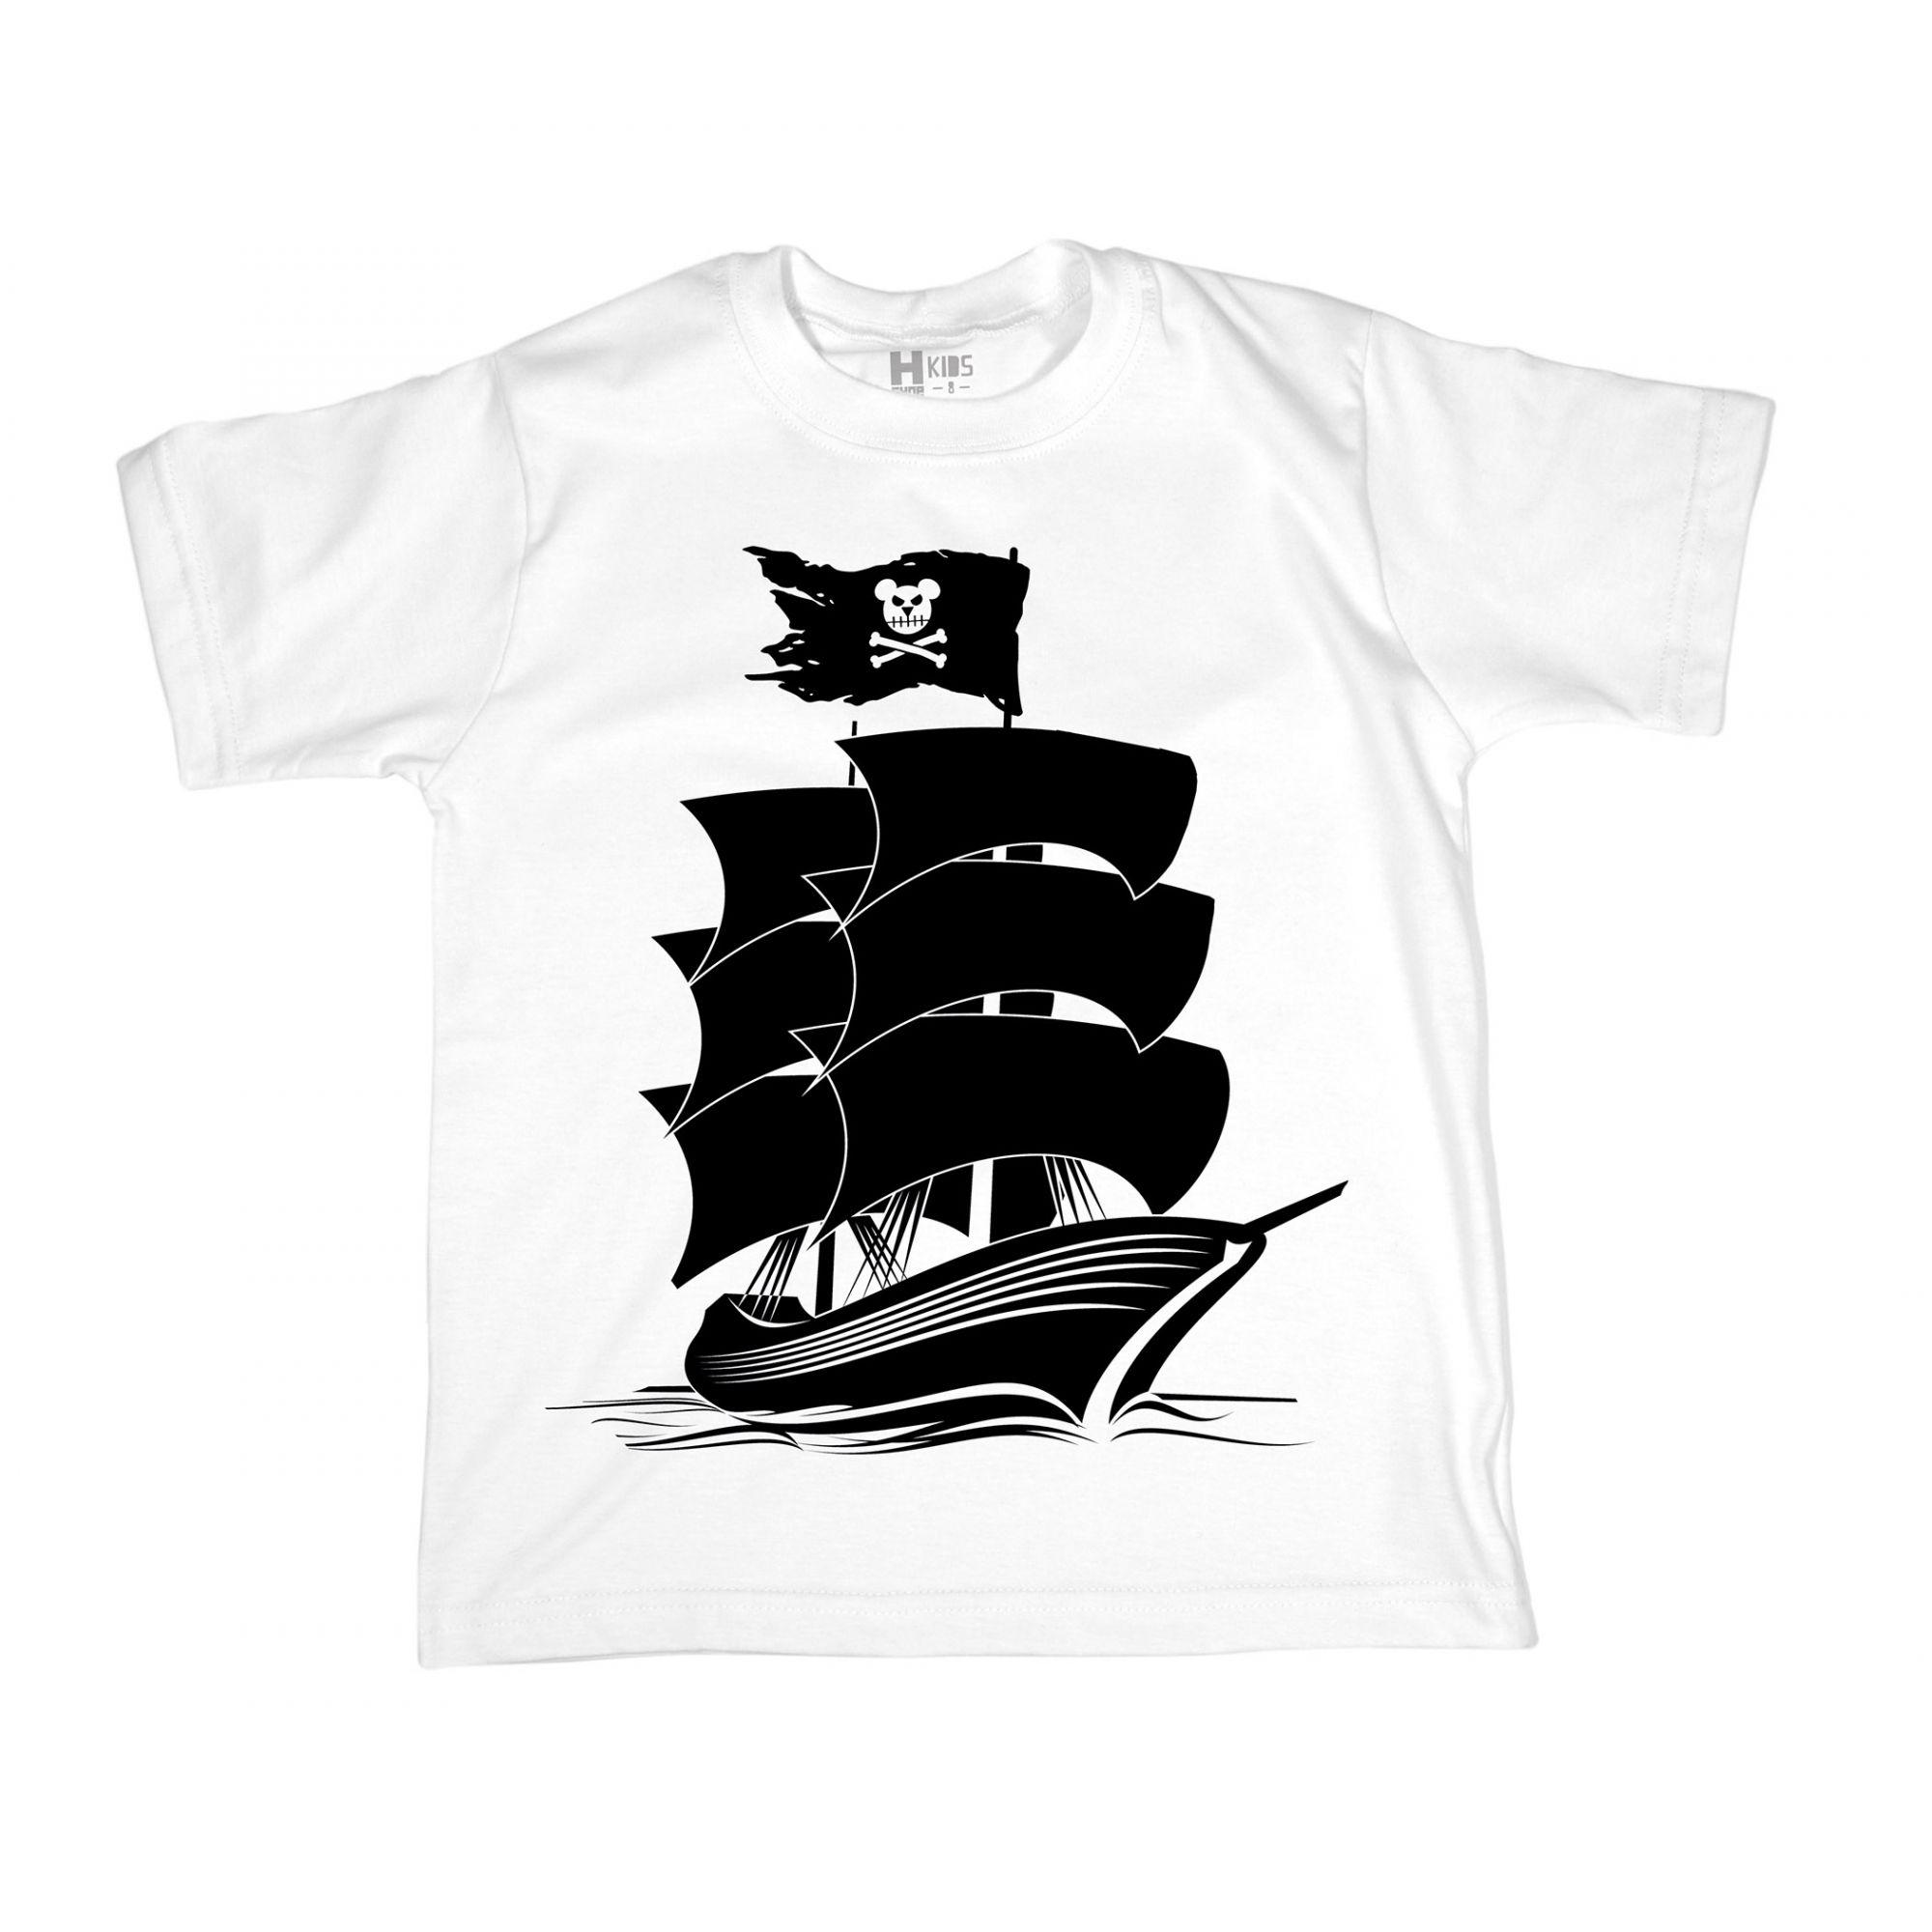 Camiseta Infantil HShop Comando Urso Branca  - HShop